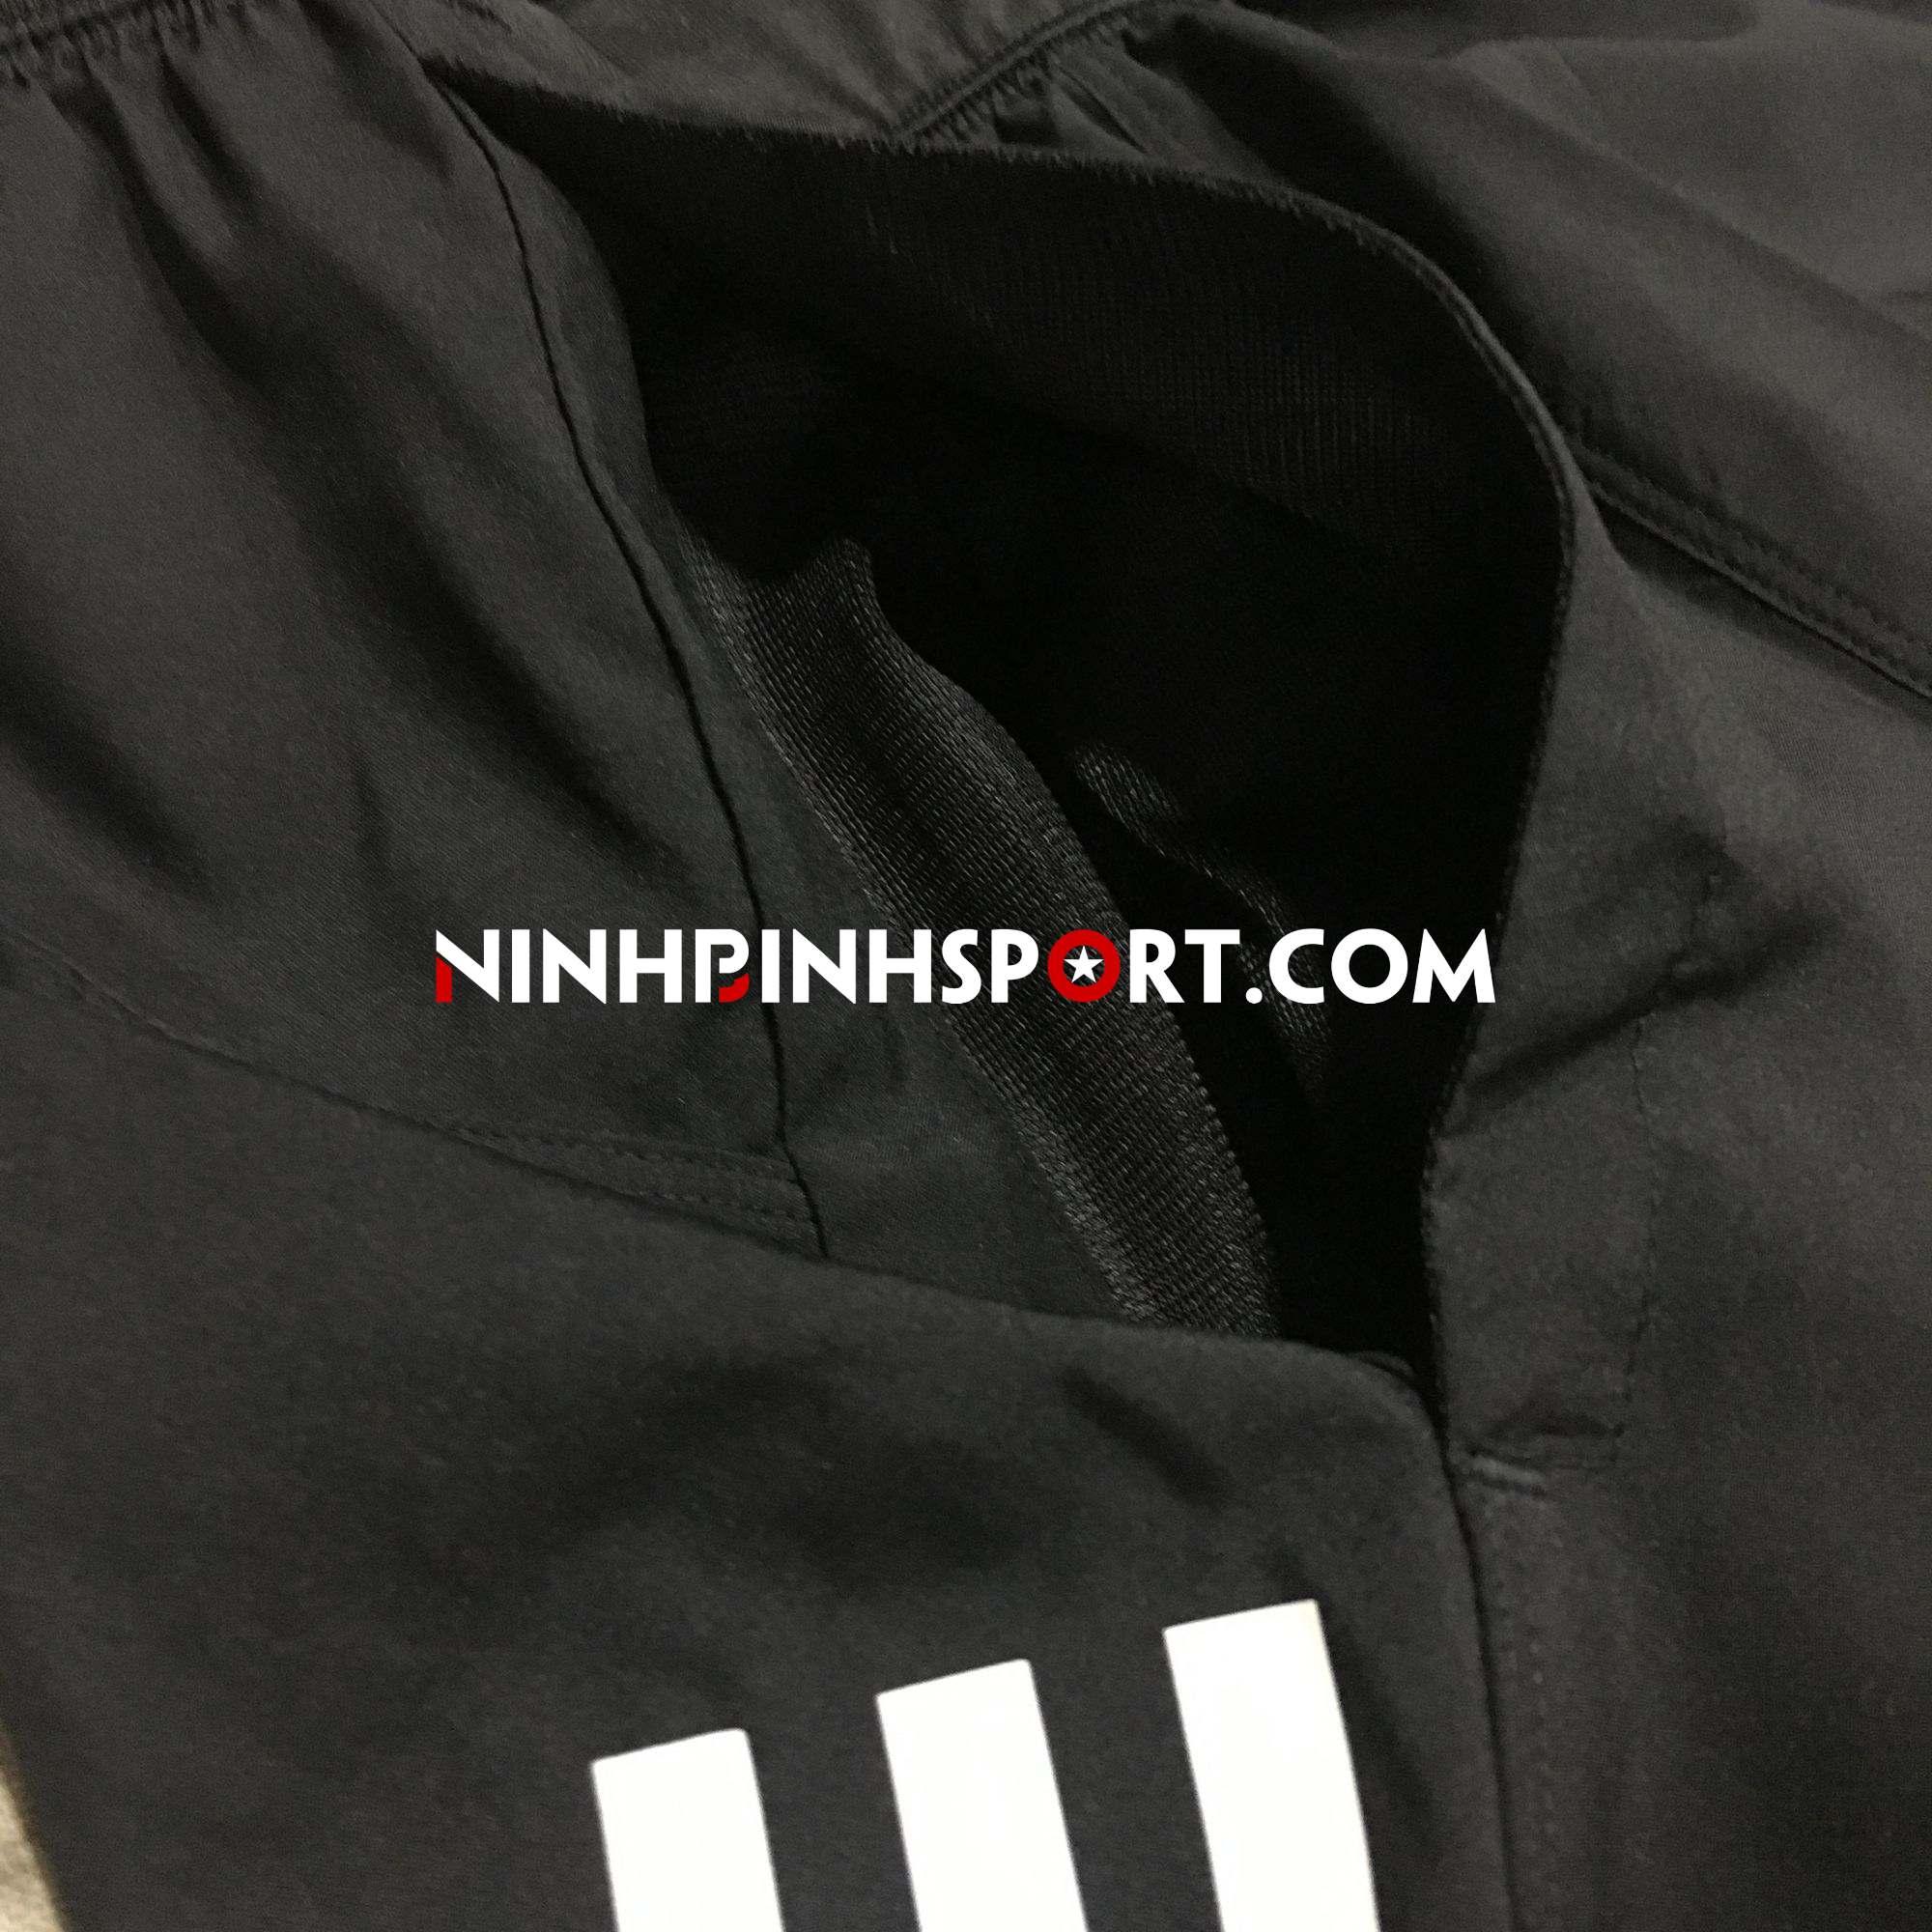 Quần thể thao nam Adidas 4krft Tech Woven 3-Stripes Shorts DQ2860